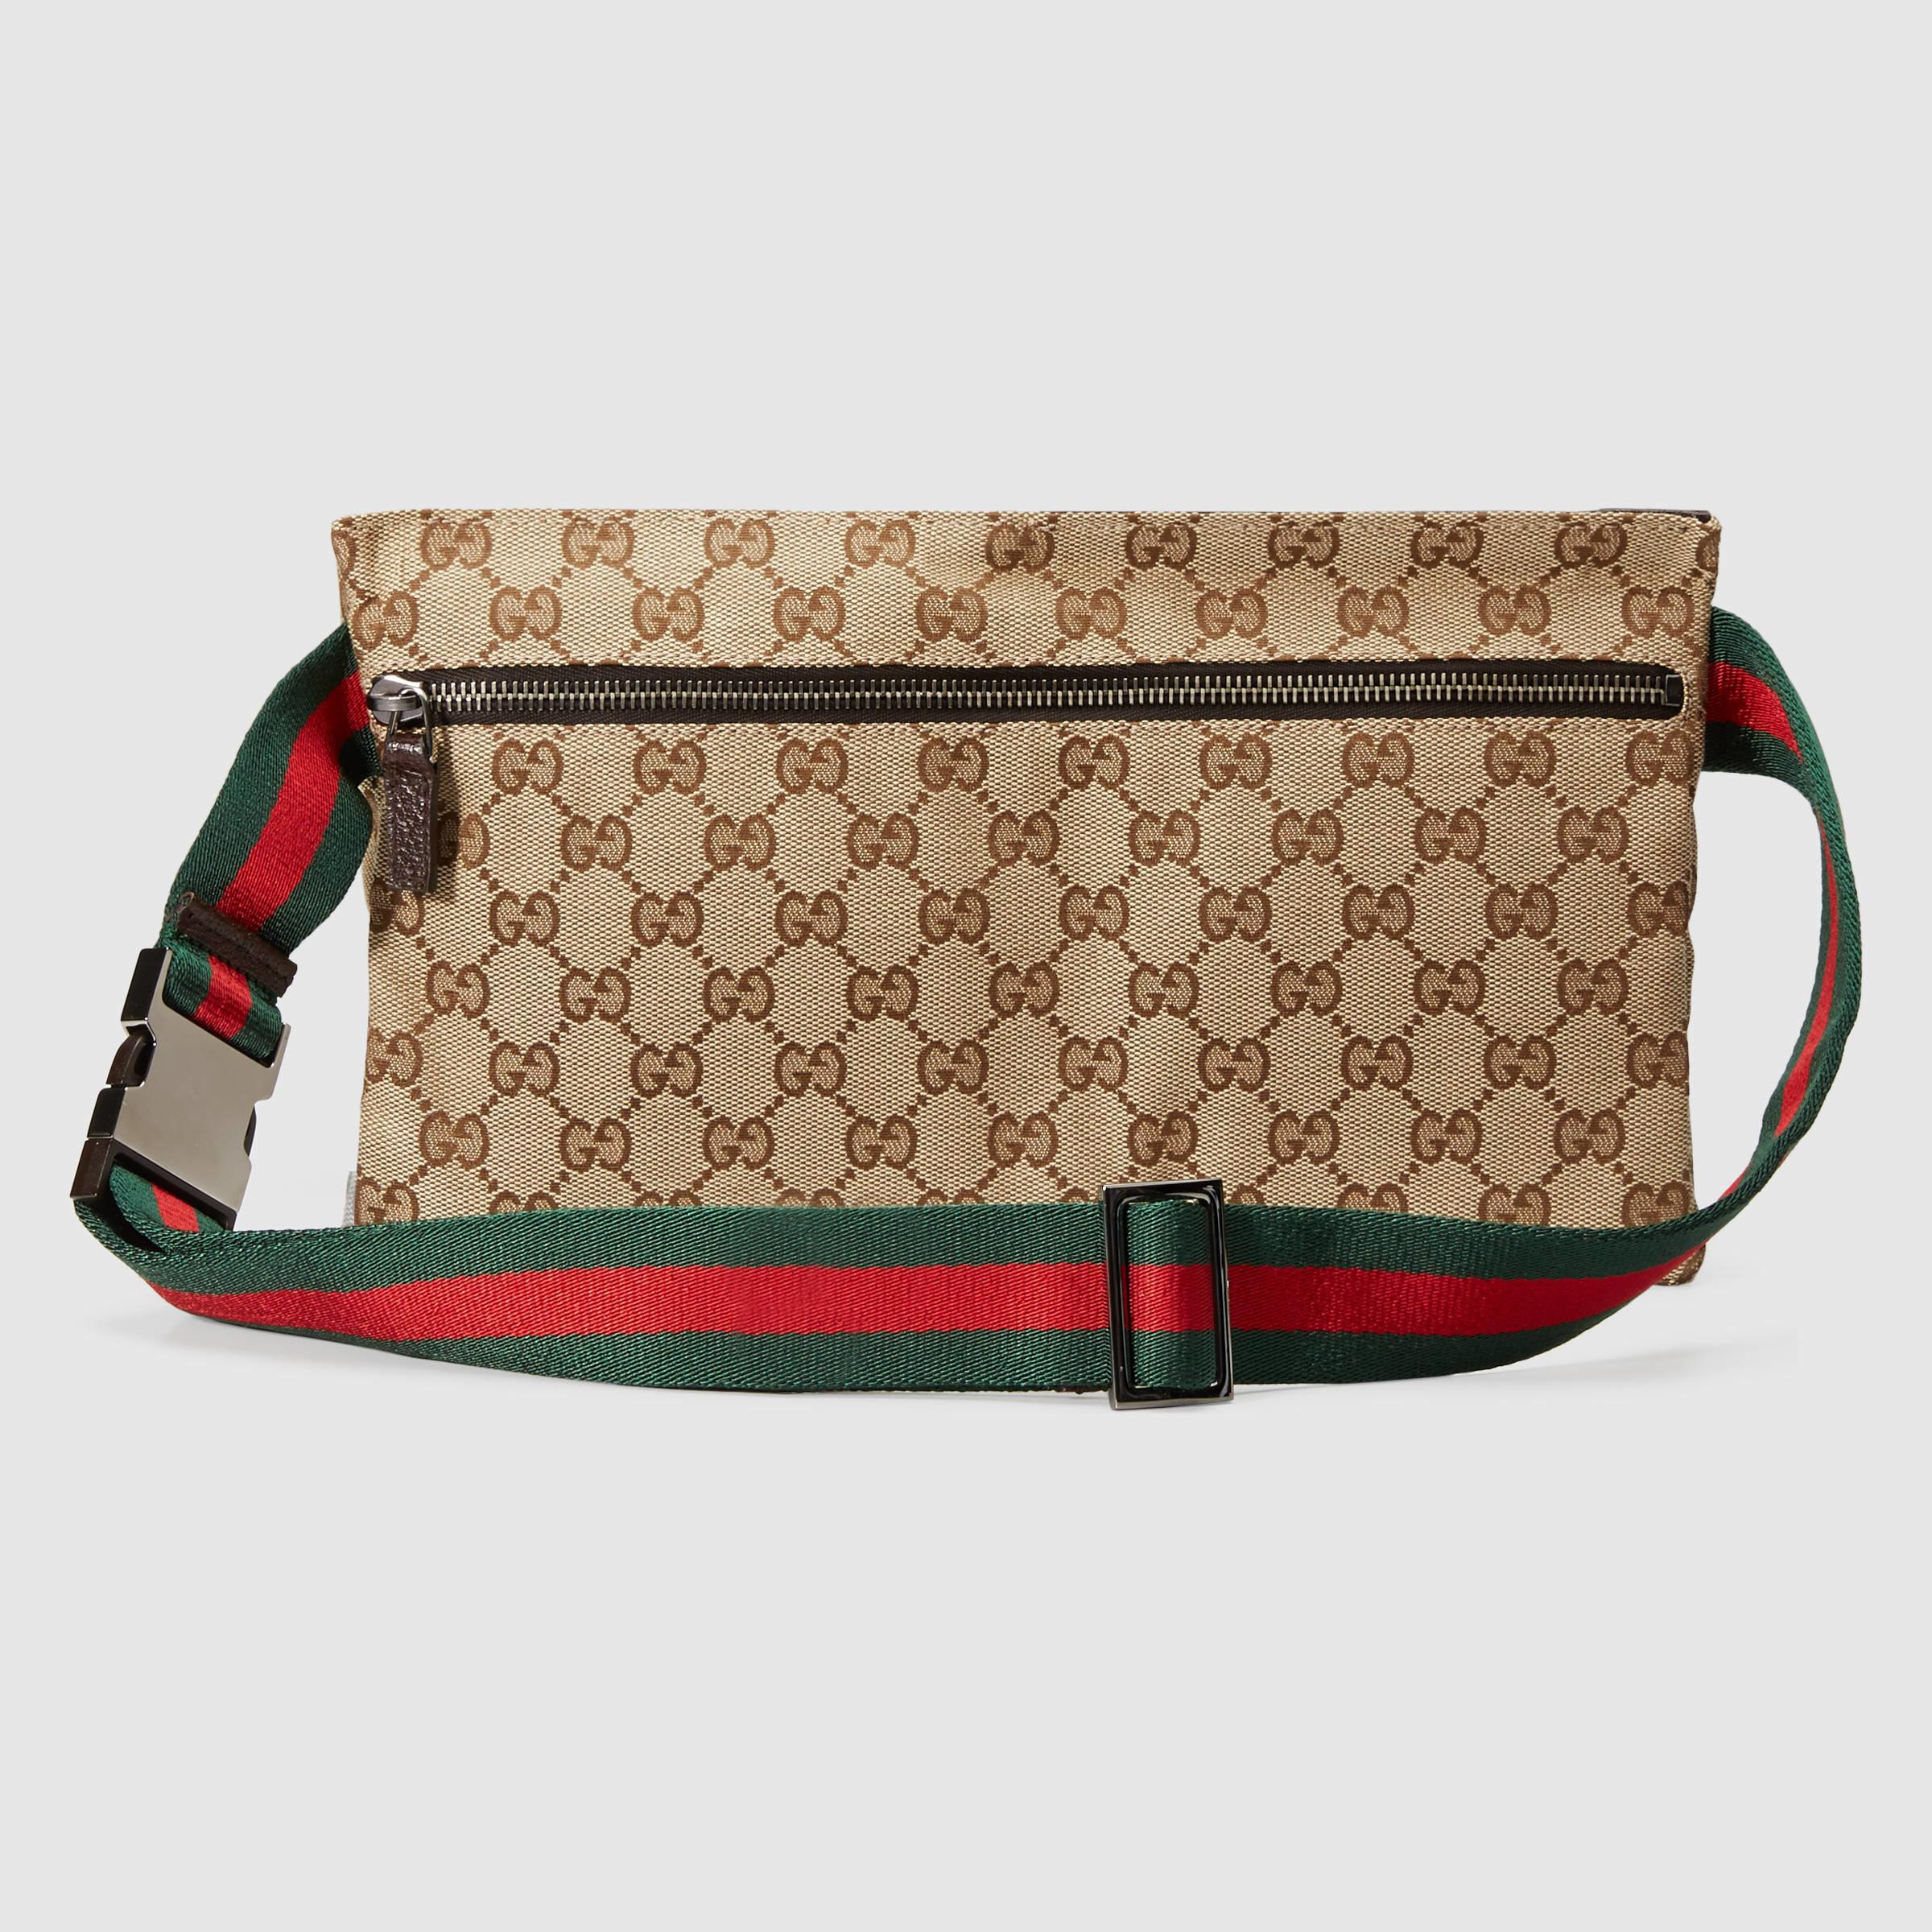 eff63f2d3b01 By billupsforcongress Gucci Original Gg Canvas Backpack